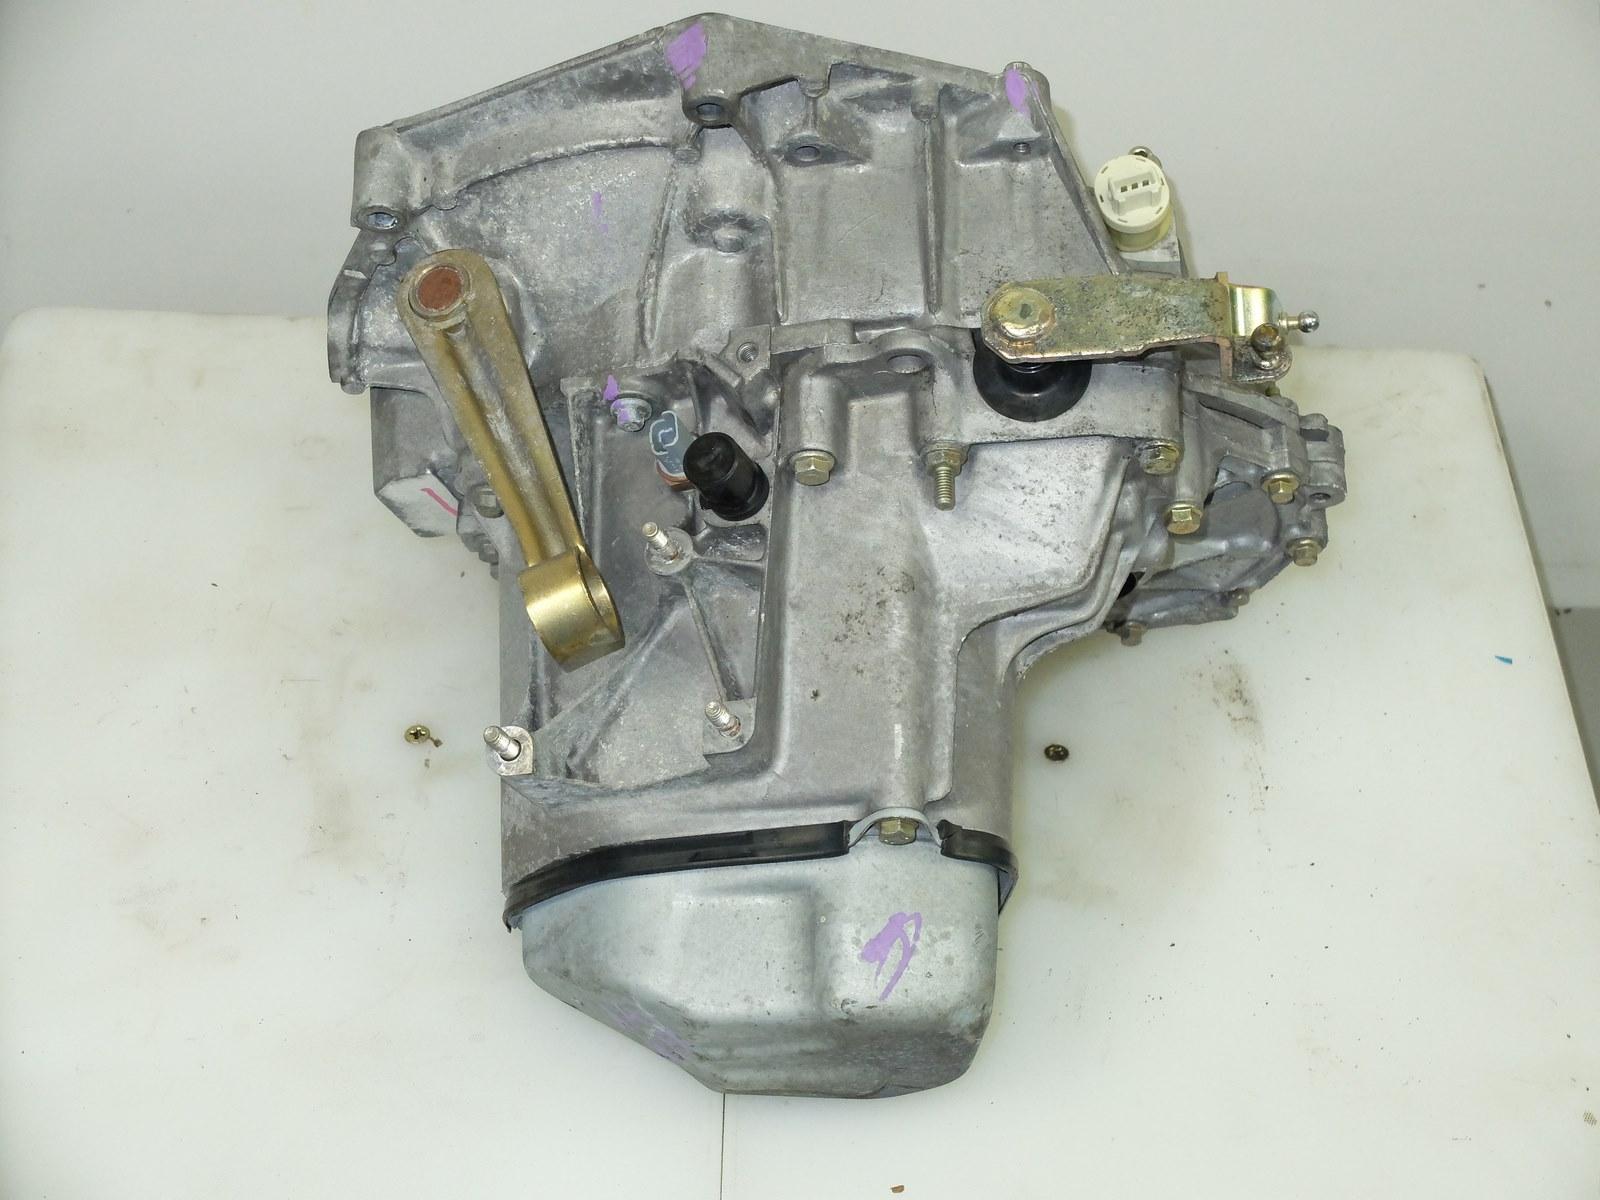 Freemoto - Skrzynia biegów Peugeot 206 1.4 V8, 1.1 V8 (1998-